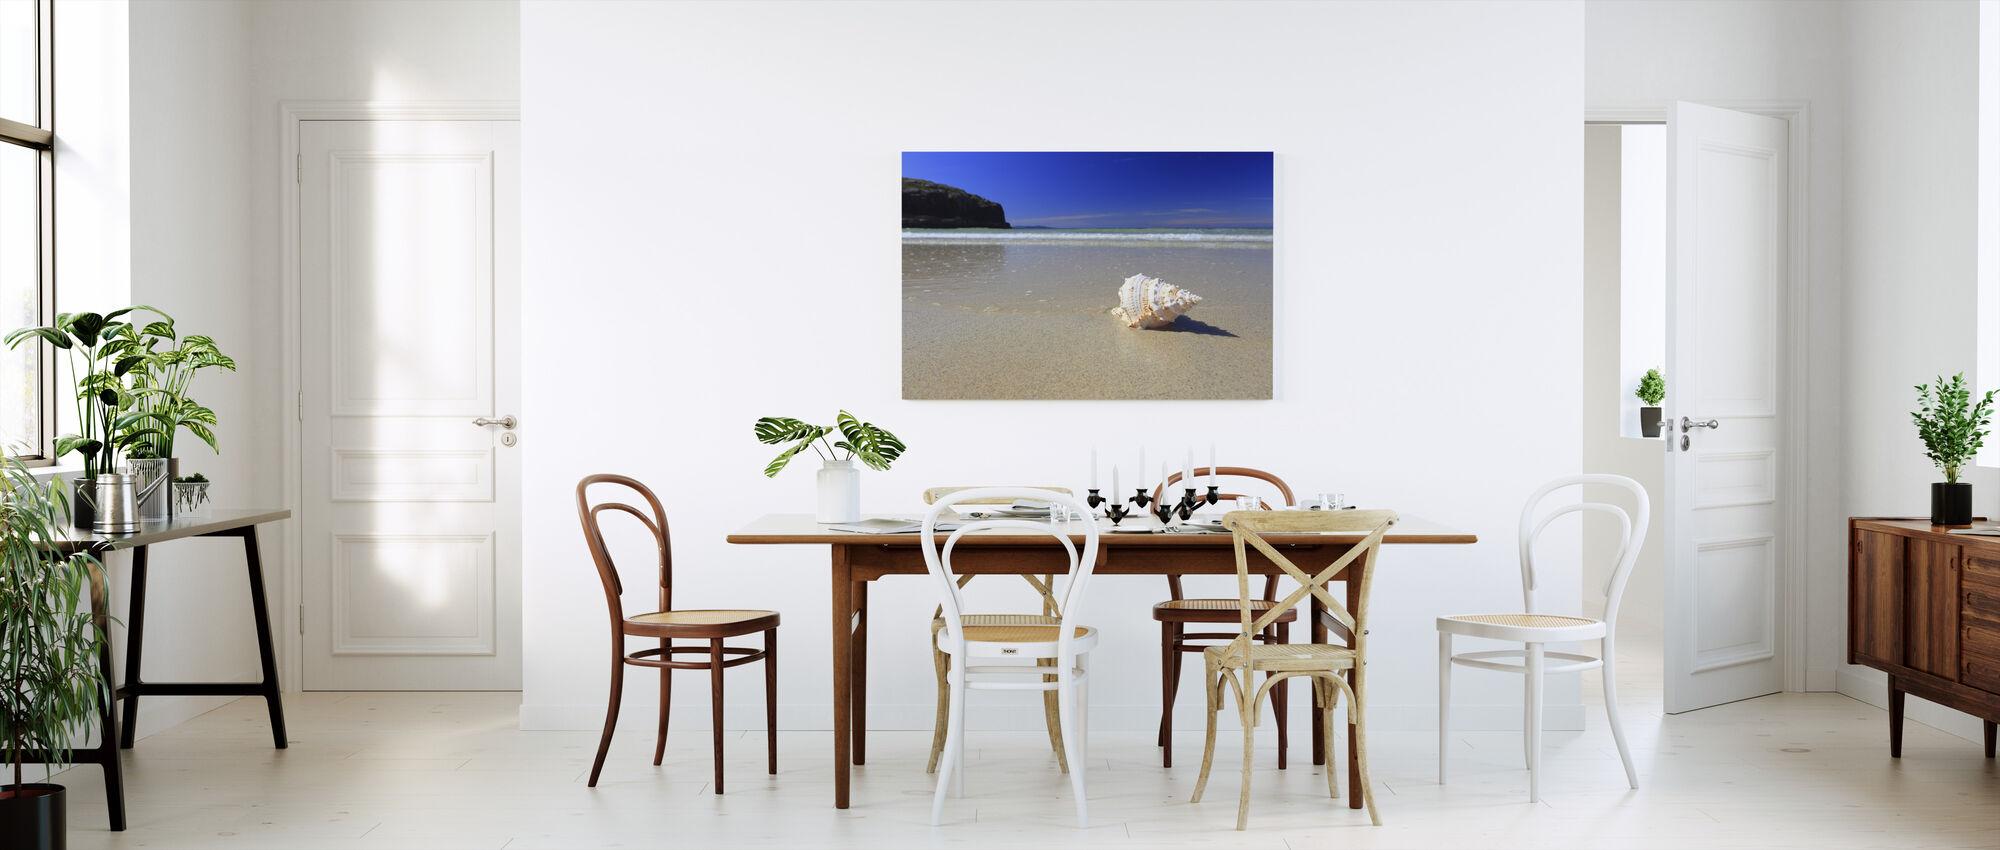 Shell on Beach - Canvas print - Kitchen